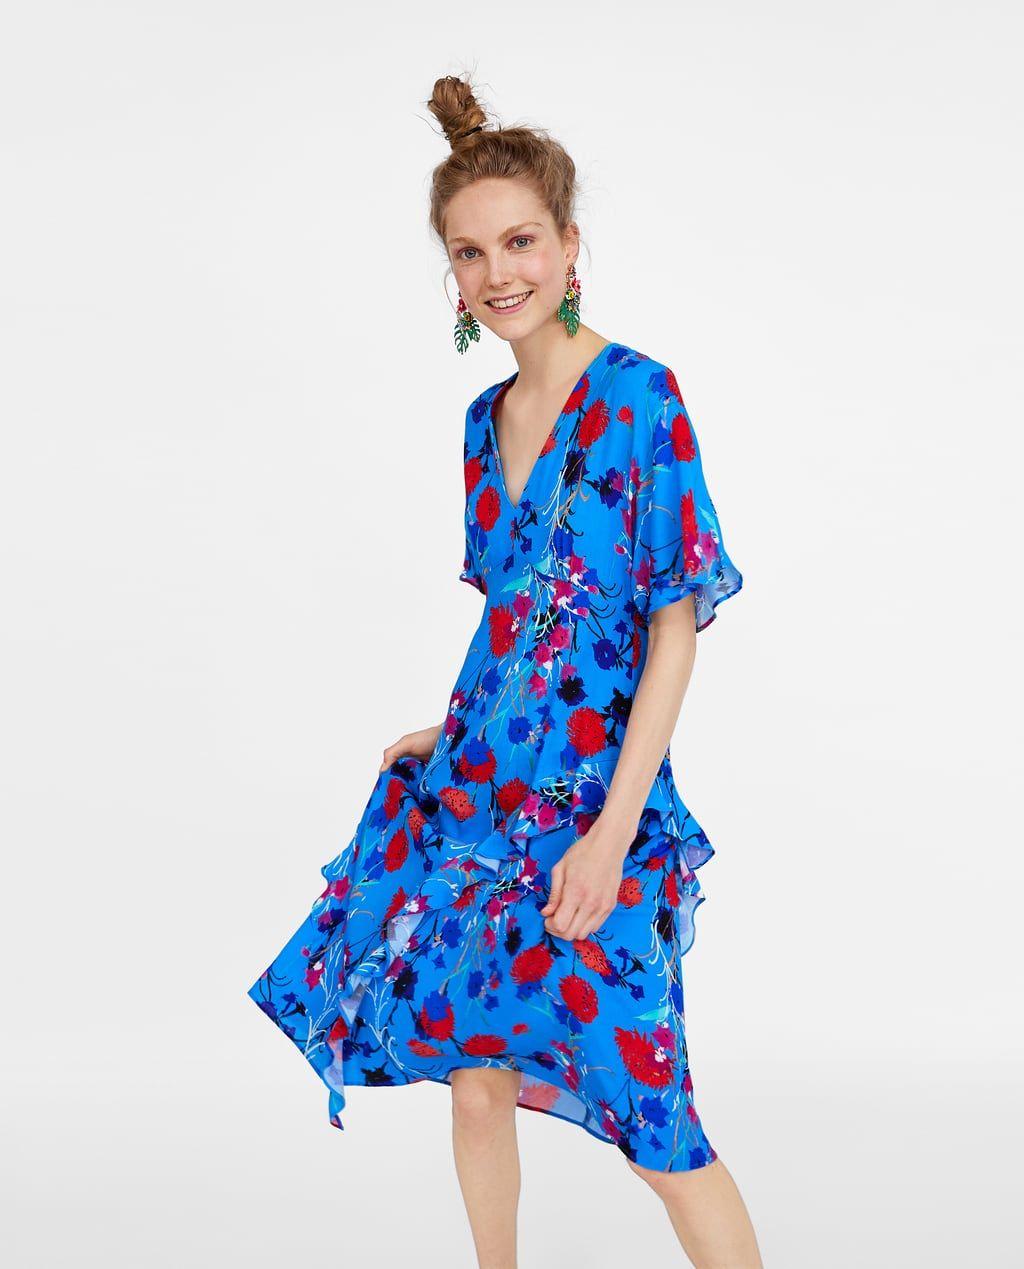 Printed Dress With Frills Summer Dresses Floral Dress Wedding Guest Dresses [ 1269 x 1024 Pixel ]